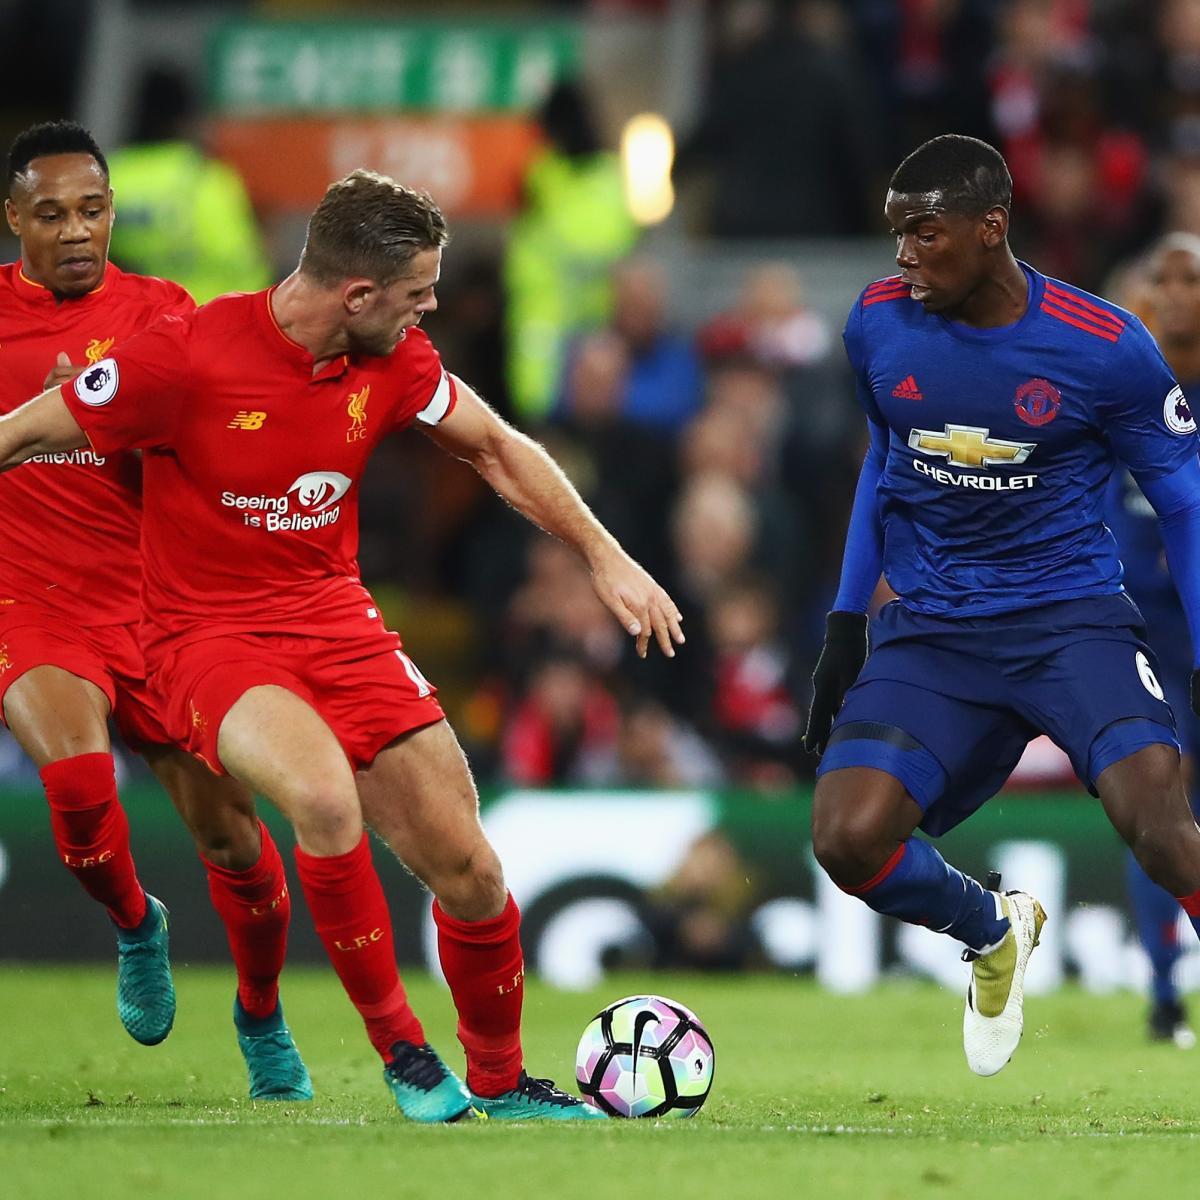 Psg Vs Manchester City Live Score Highlights From: Liverpool Vs. Manchester United: Live Score, Highlights